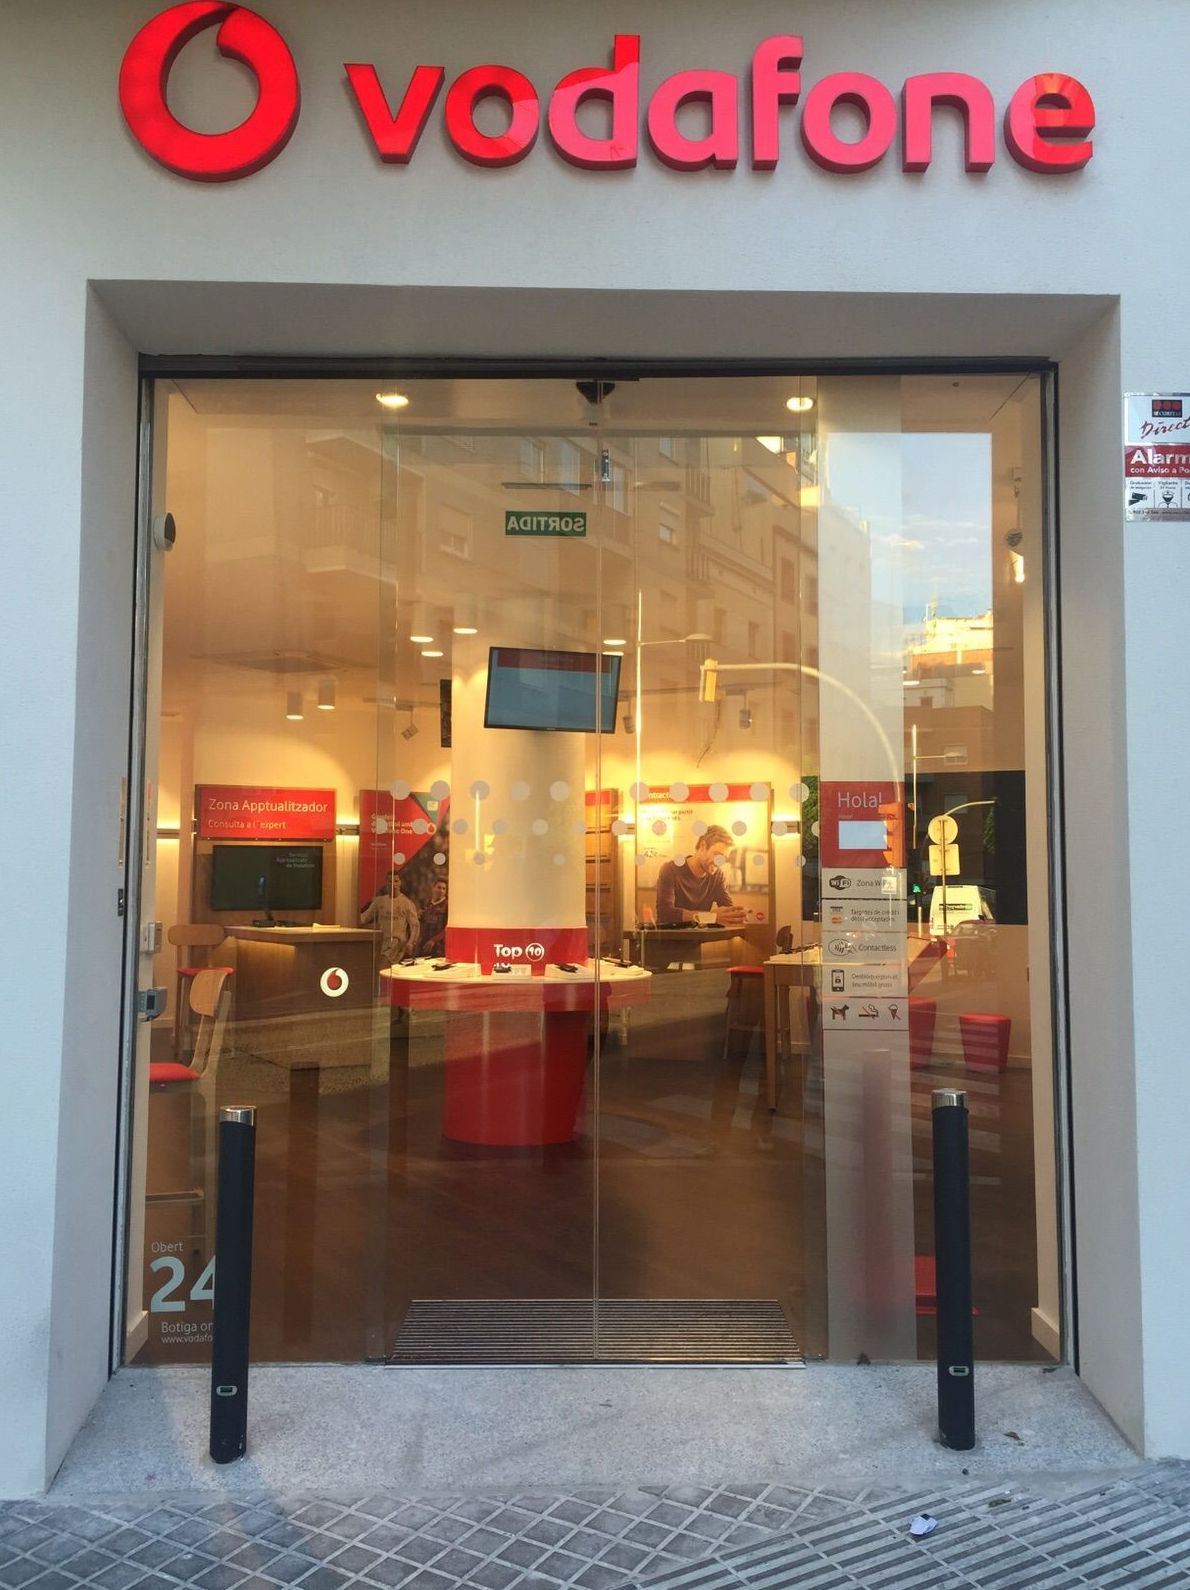 Distribuidor de Vodafone en Cornellà